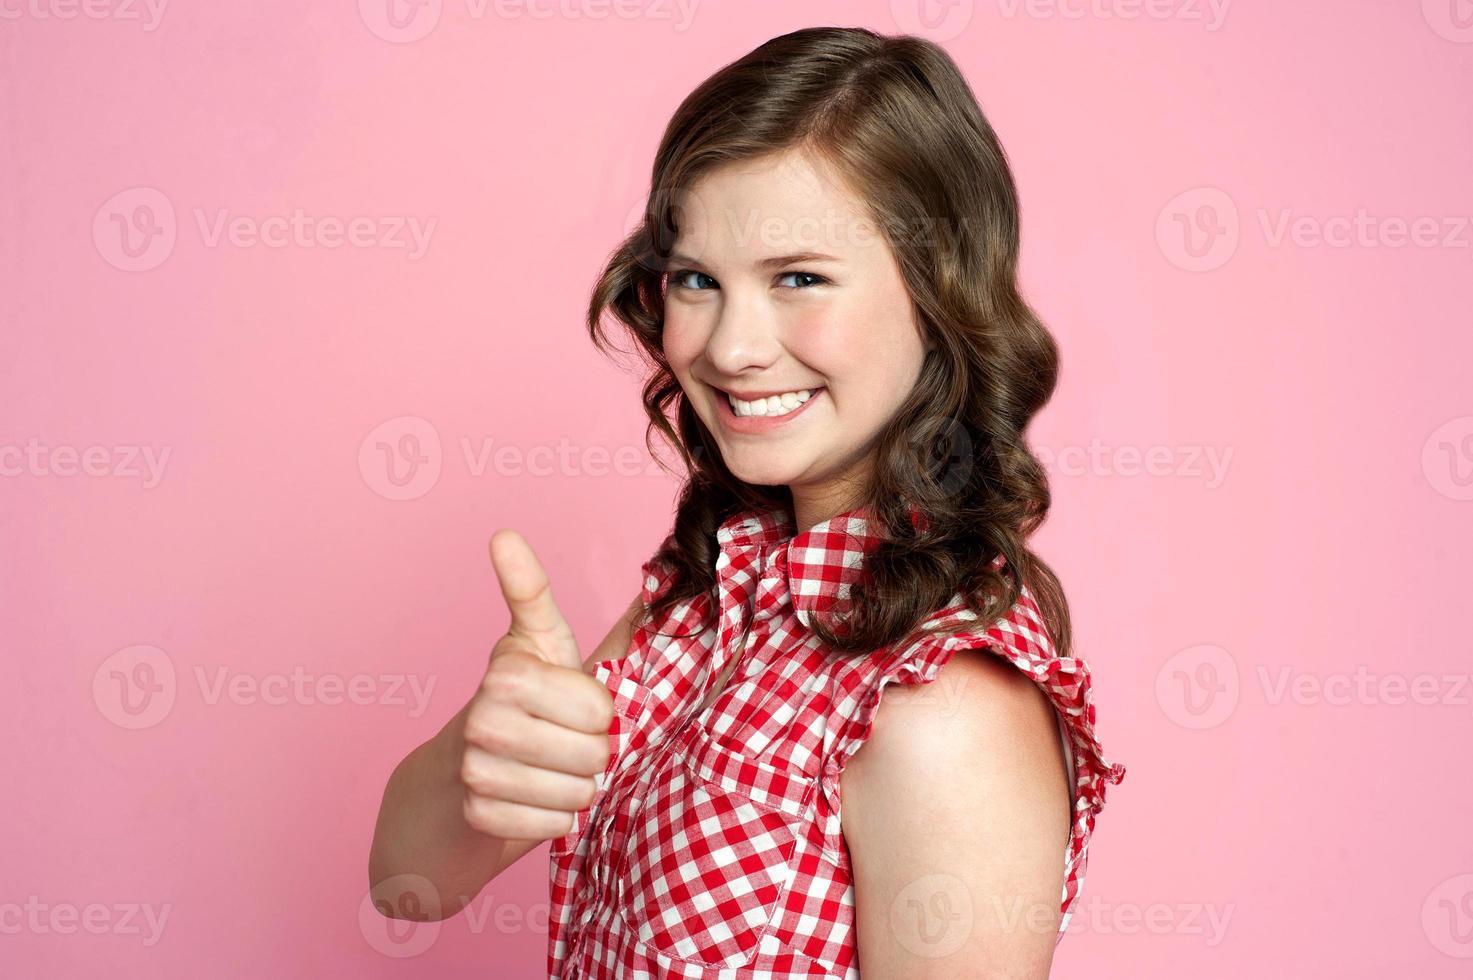 belle fille souriante avec geste ok photo